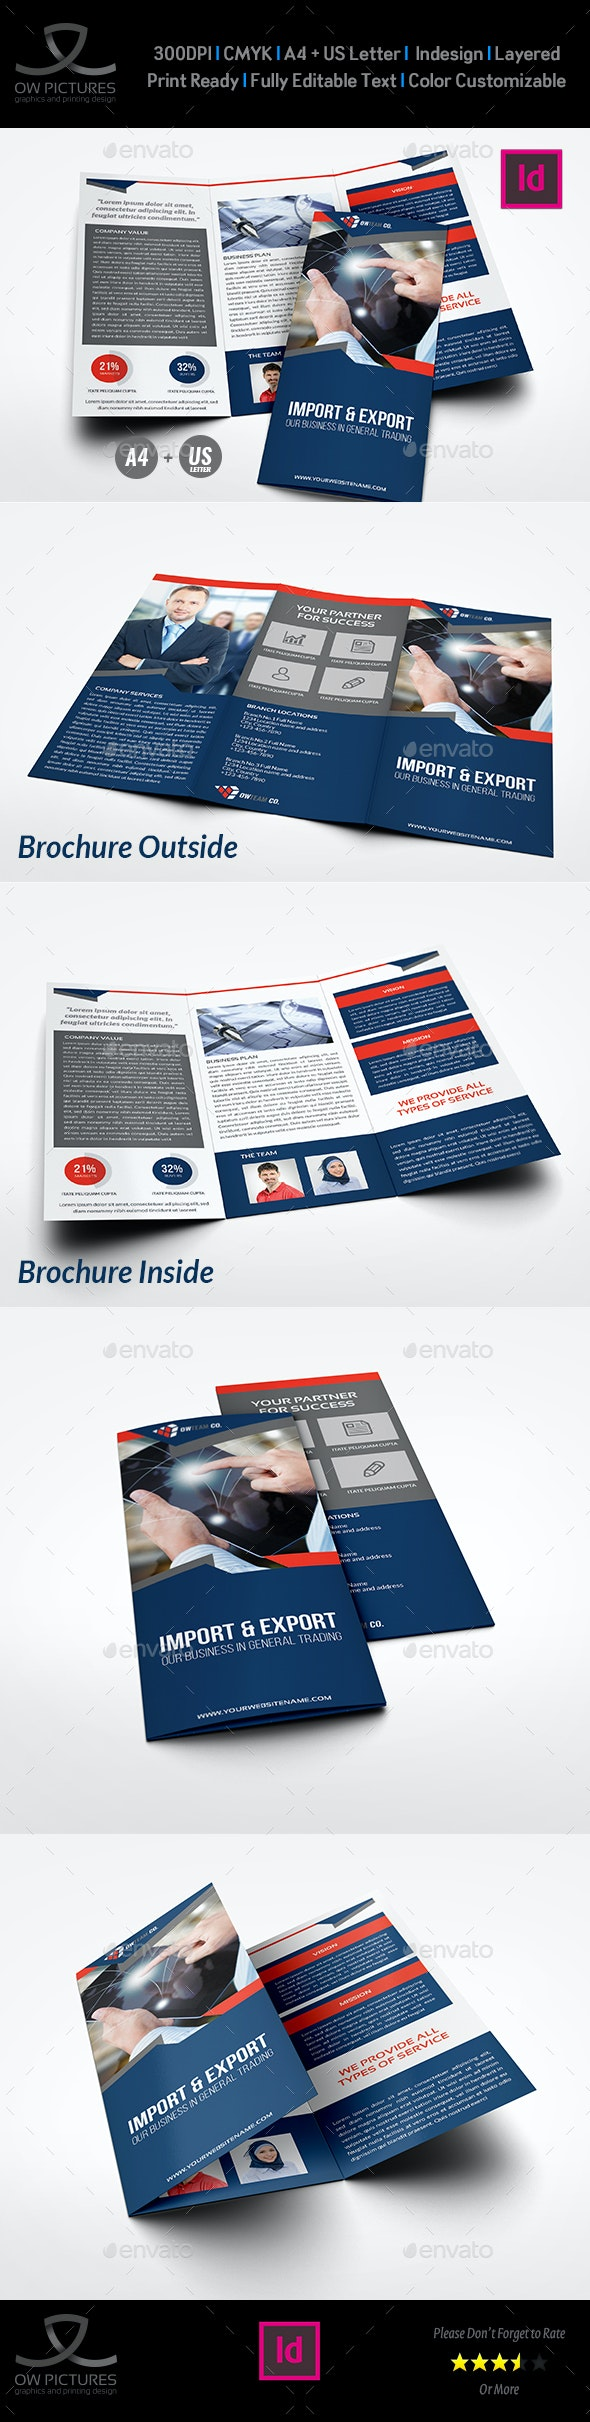 Company Profile Tri-Fold Brochure Vol.24 - Corporate Brochures